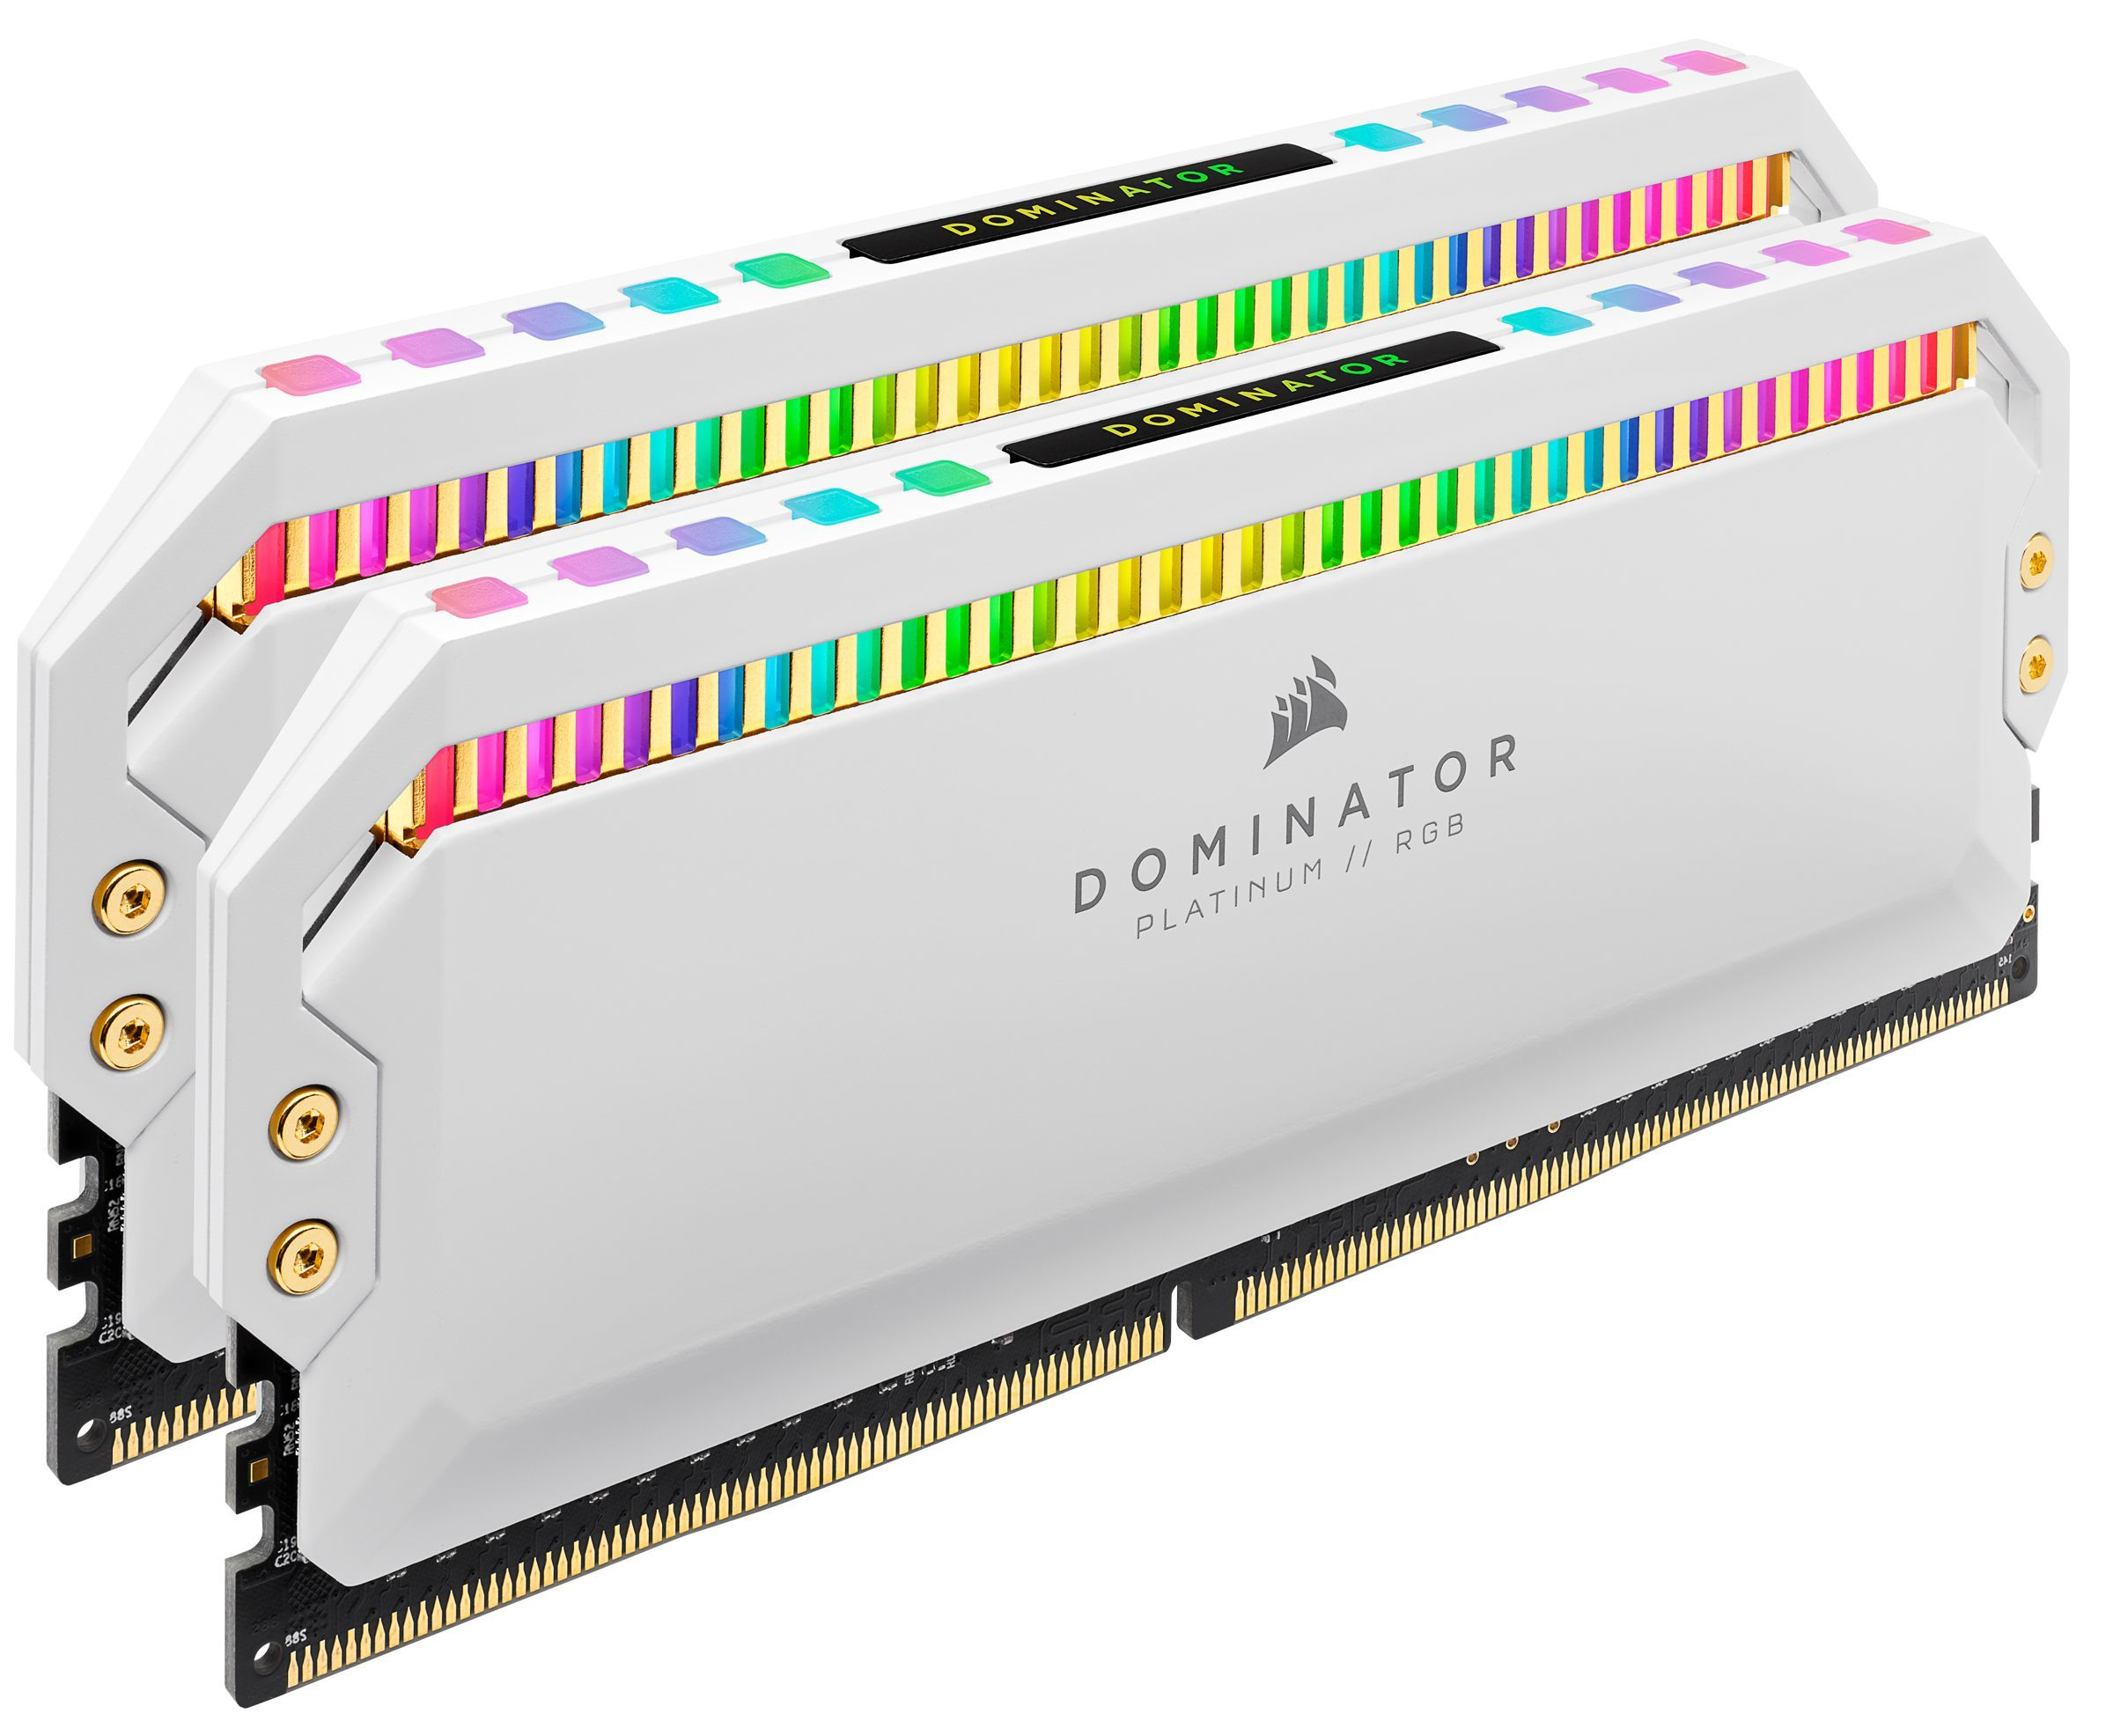 Dominator Platinum - 2 x 8 Go - DDR4 3200 MHz - RGB - Blanc